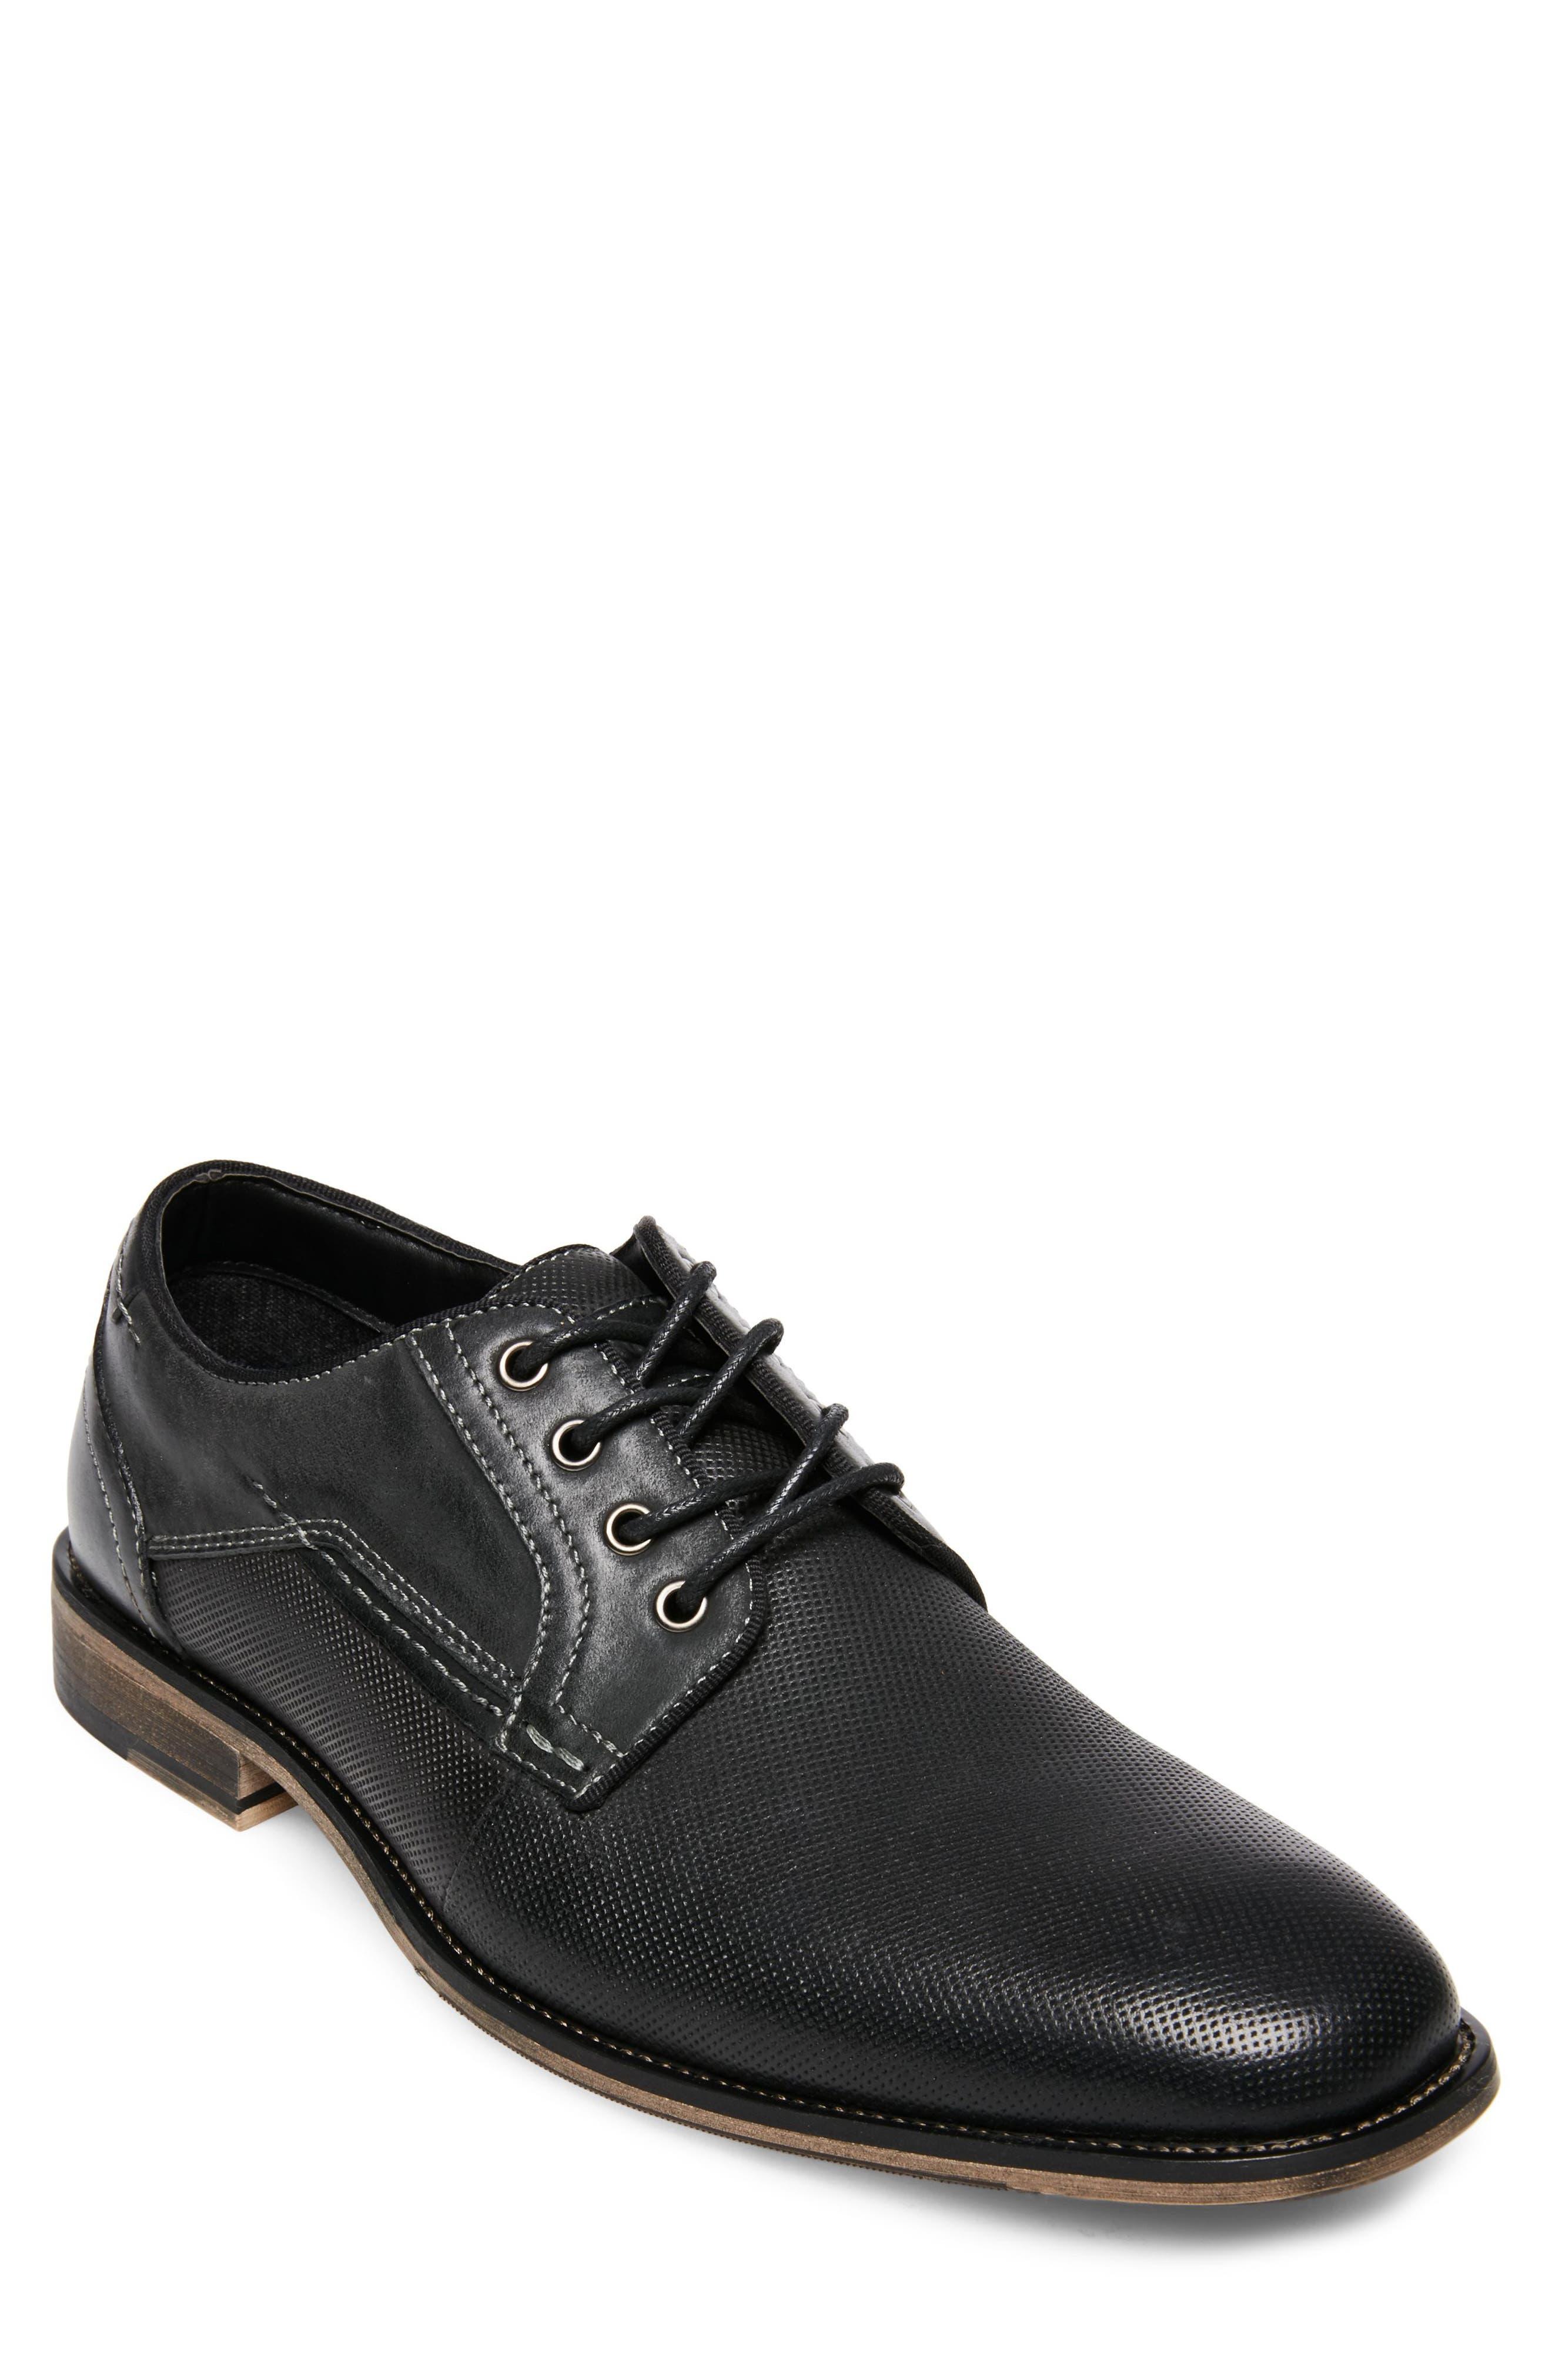 Jaysun Embossed Plain Toe Derby,                             Main thumbnail 1, color,                             Dark Grey Leather